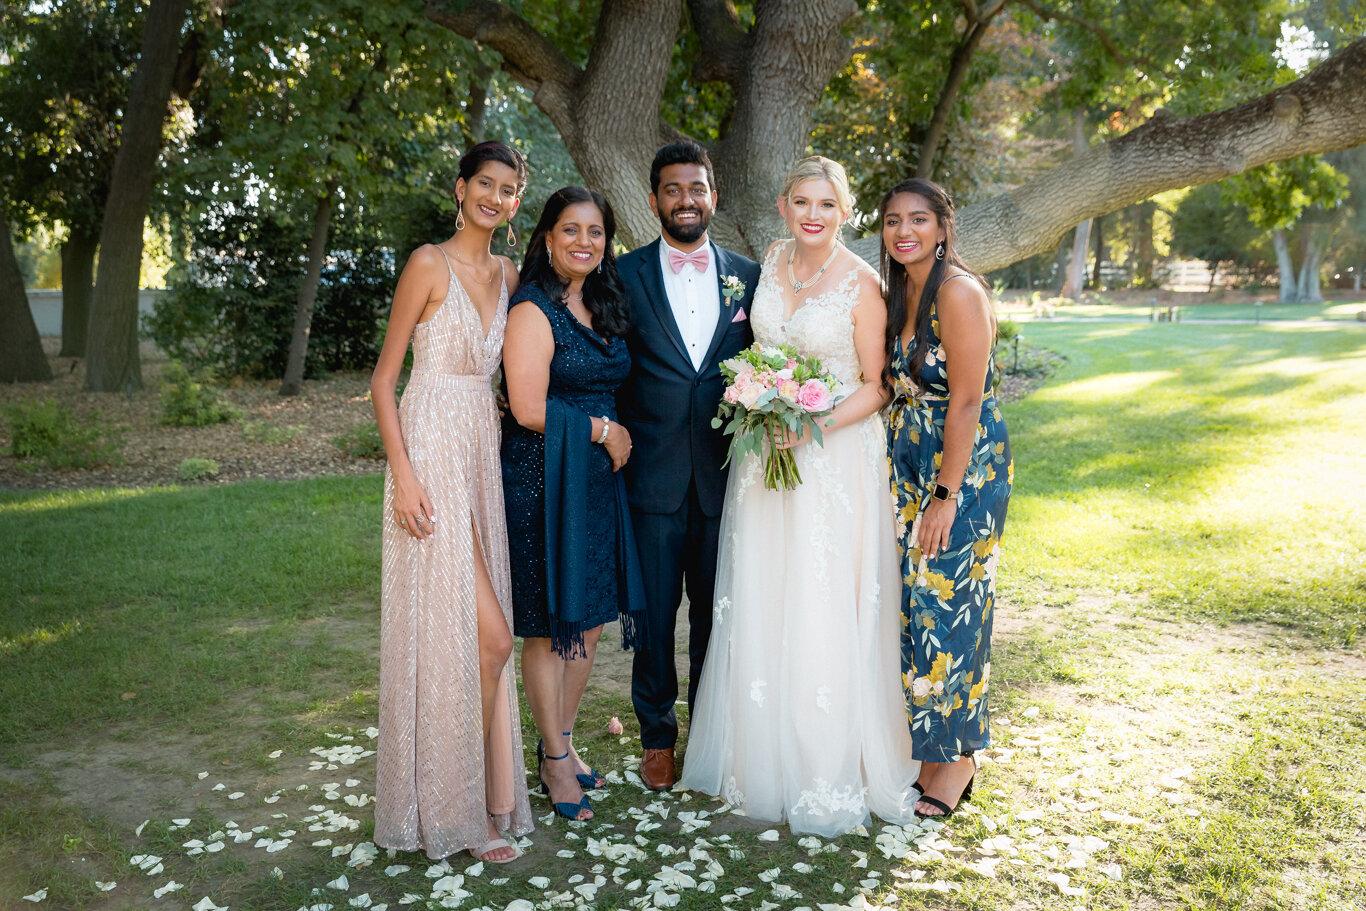 2019.08.24_Emily-Ashir-Wedding-at-the-Maples-6078.jpg